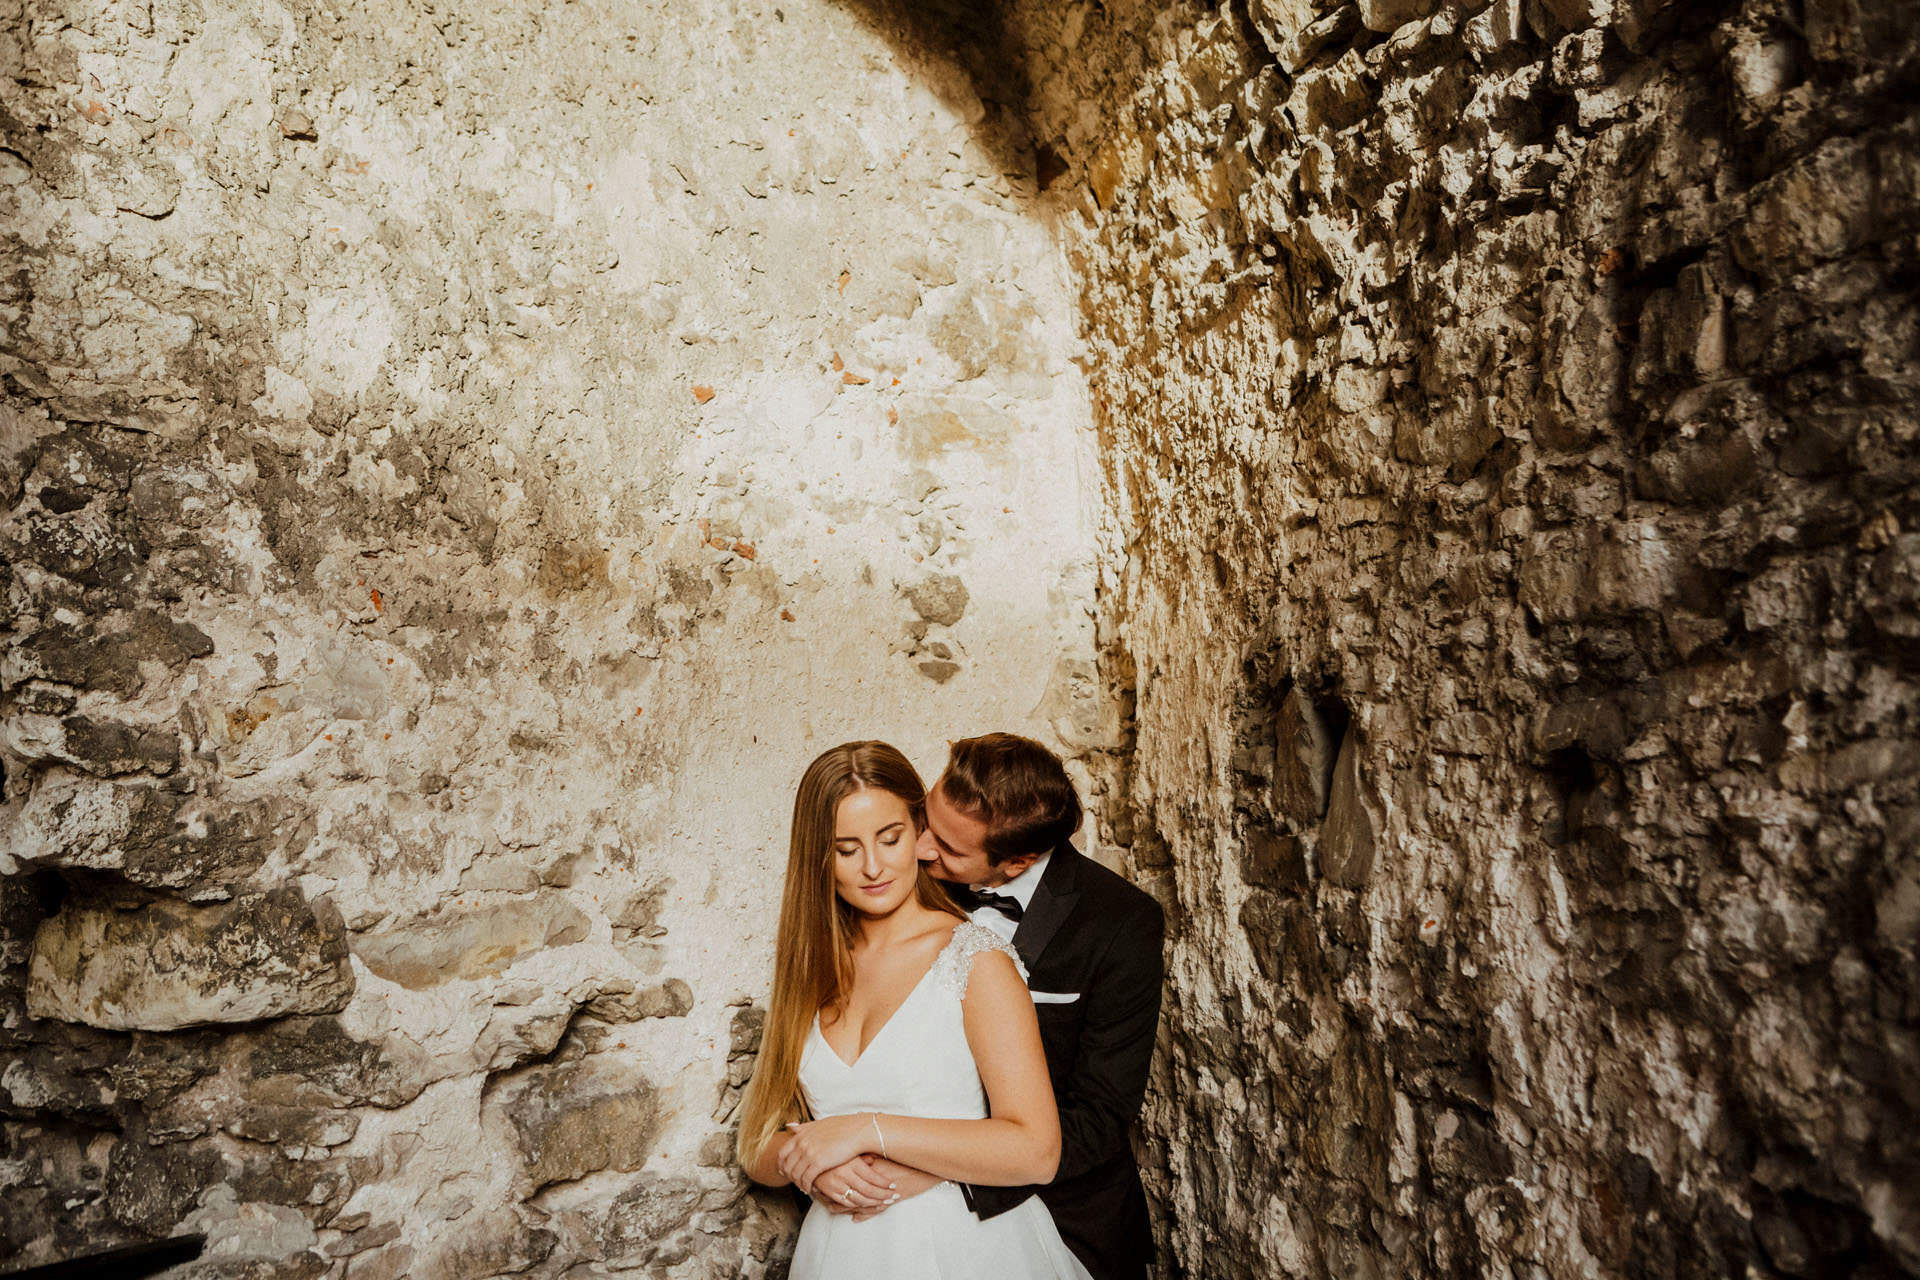 Patrycja i Patryk wesele stara zajezdnia 0063